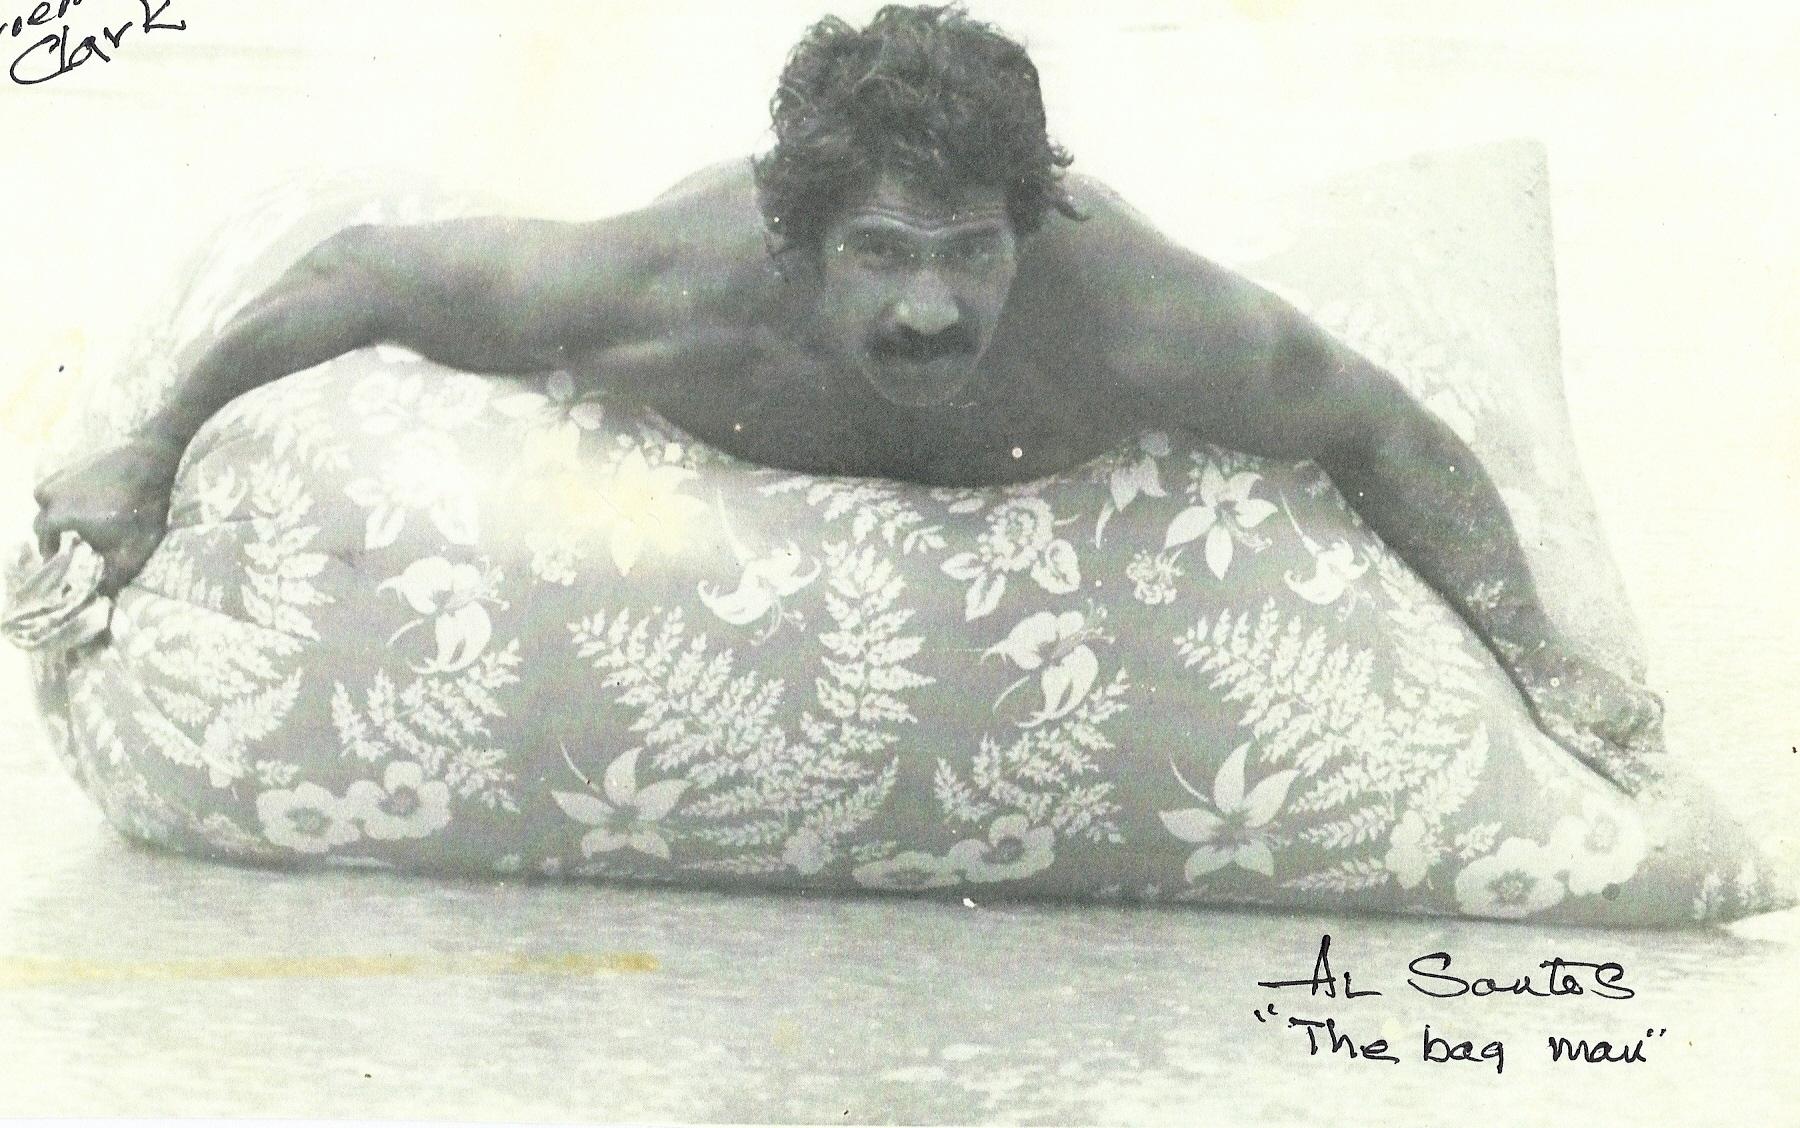 Al Santos skimming. Sandy Beach, Oahu. 1968